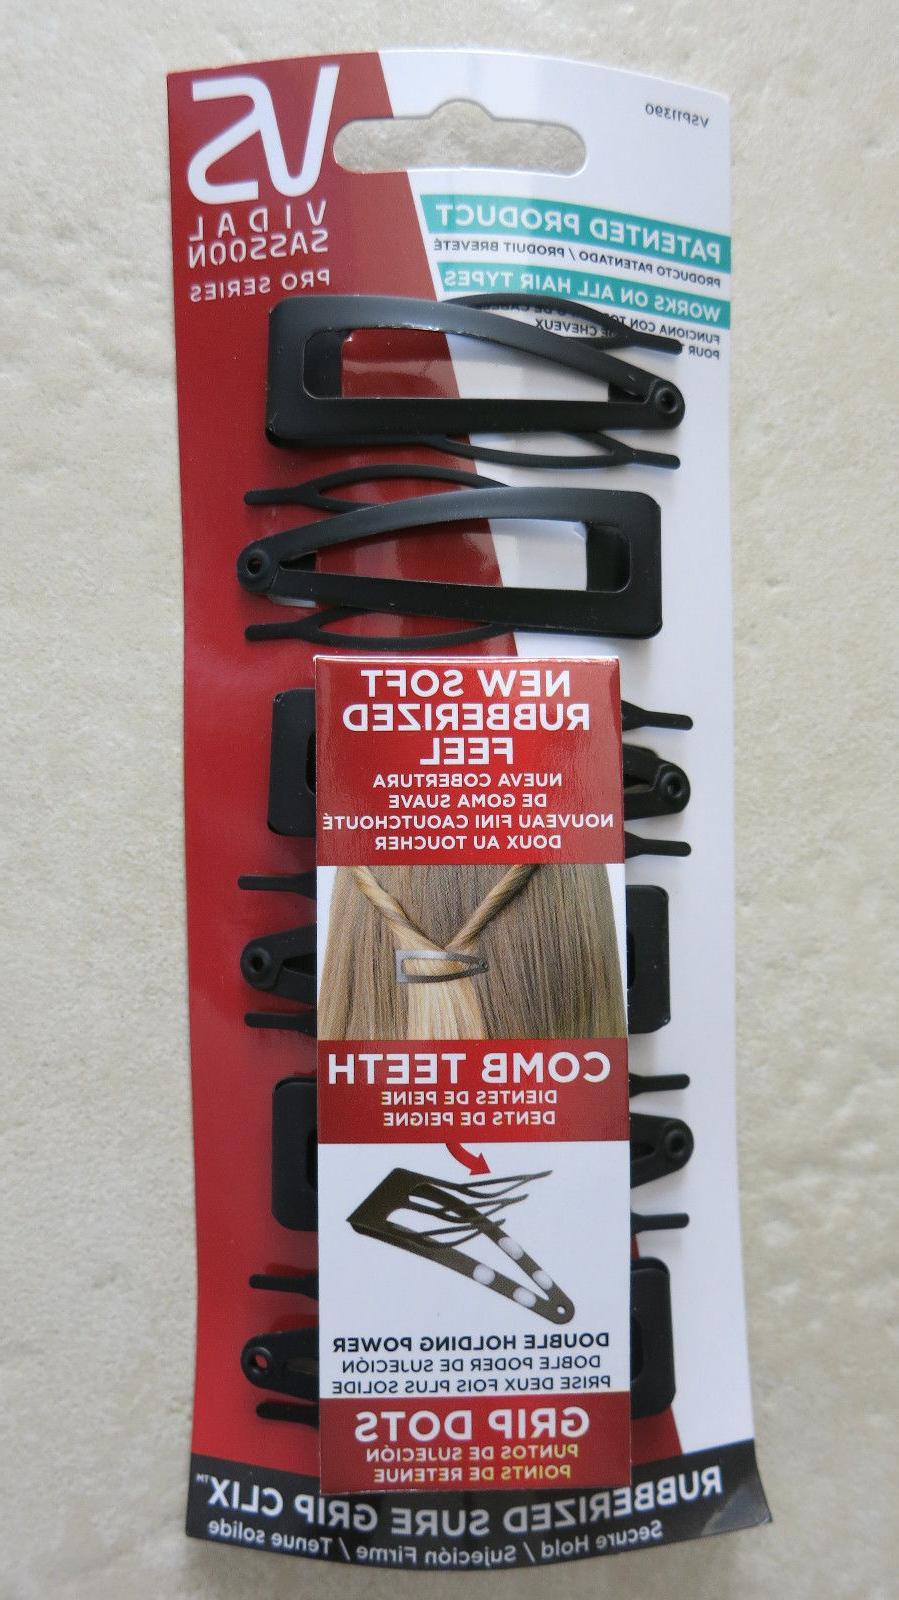 VIDAL SASSOON Pro Series Rubberized Sure Grip Clix hair clip